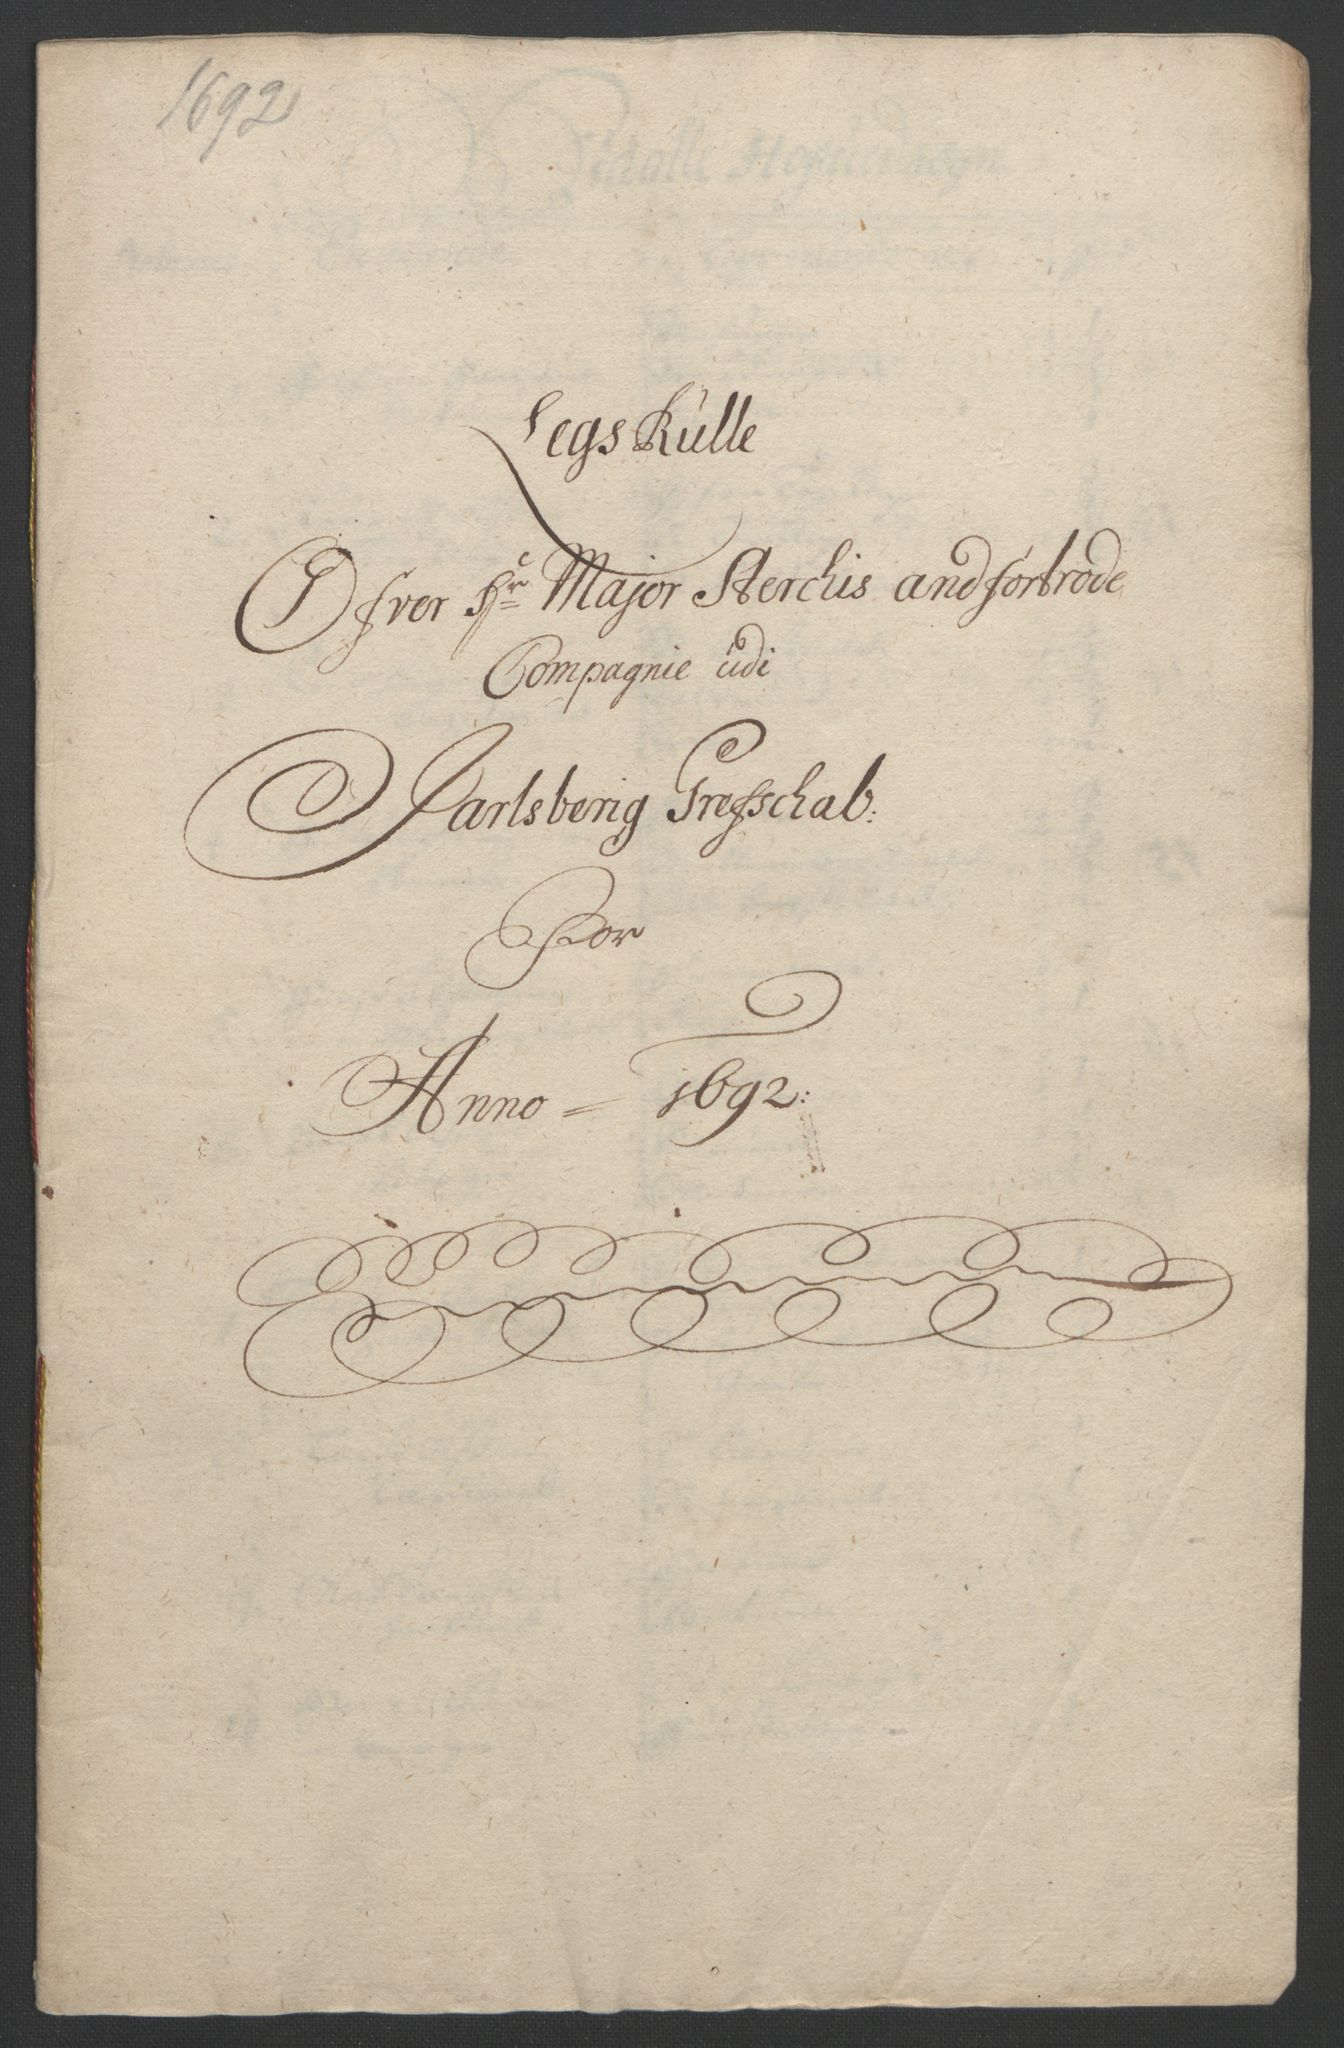 RA, Rentekammeret inntil 1814, Reviderte regnskaper, Fogderegnskap, R32/L1865: Fogderegnskap Jarlsberg grevskap, 1692, s. 207